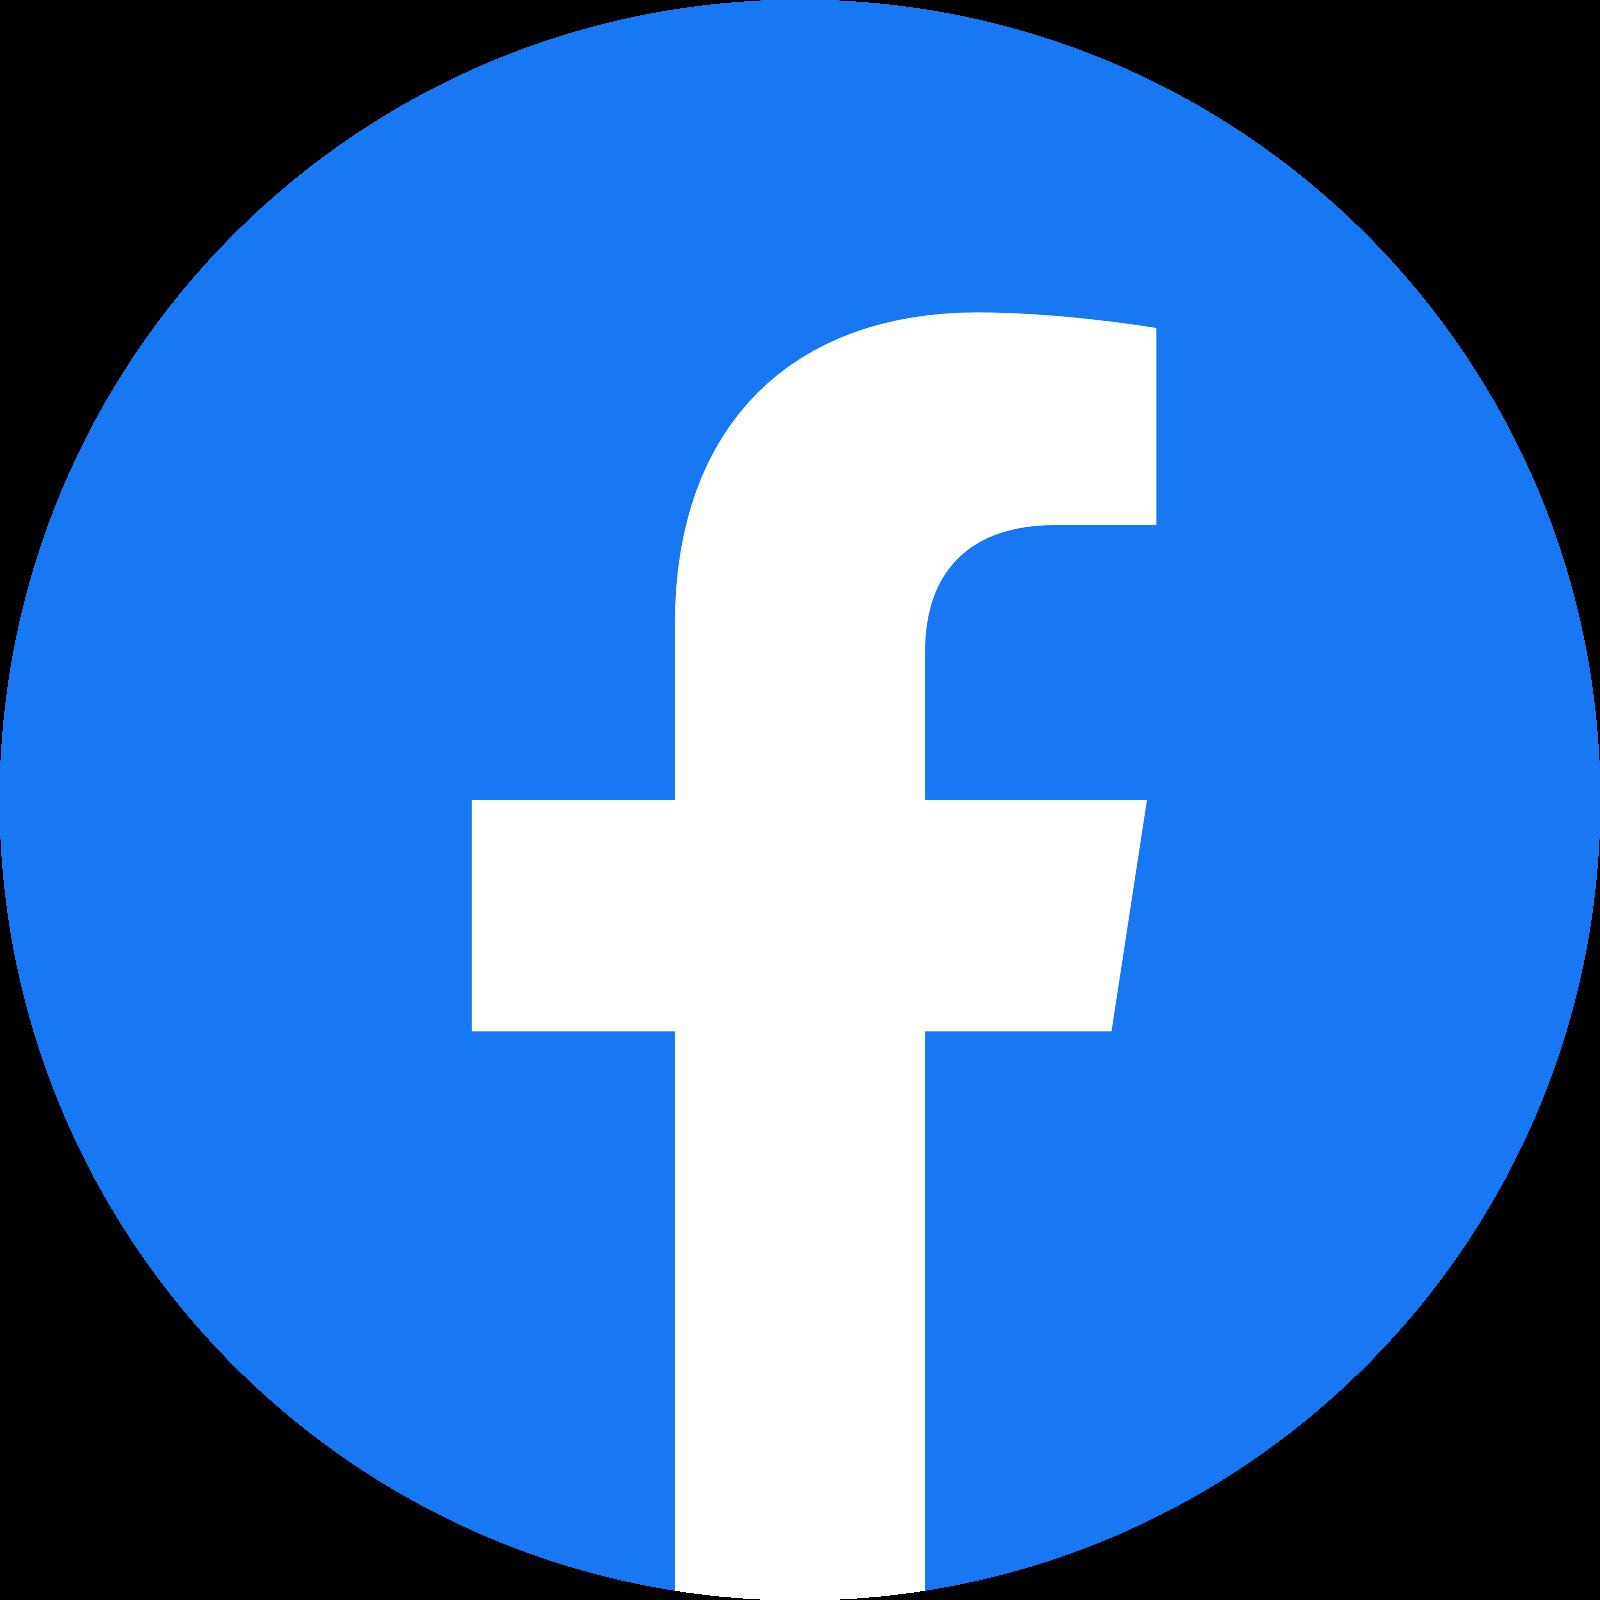 facebook-logo-2019.png